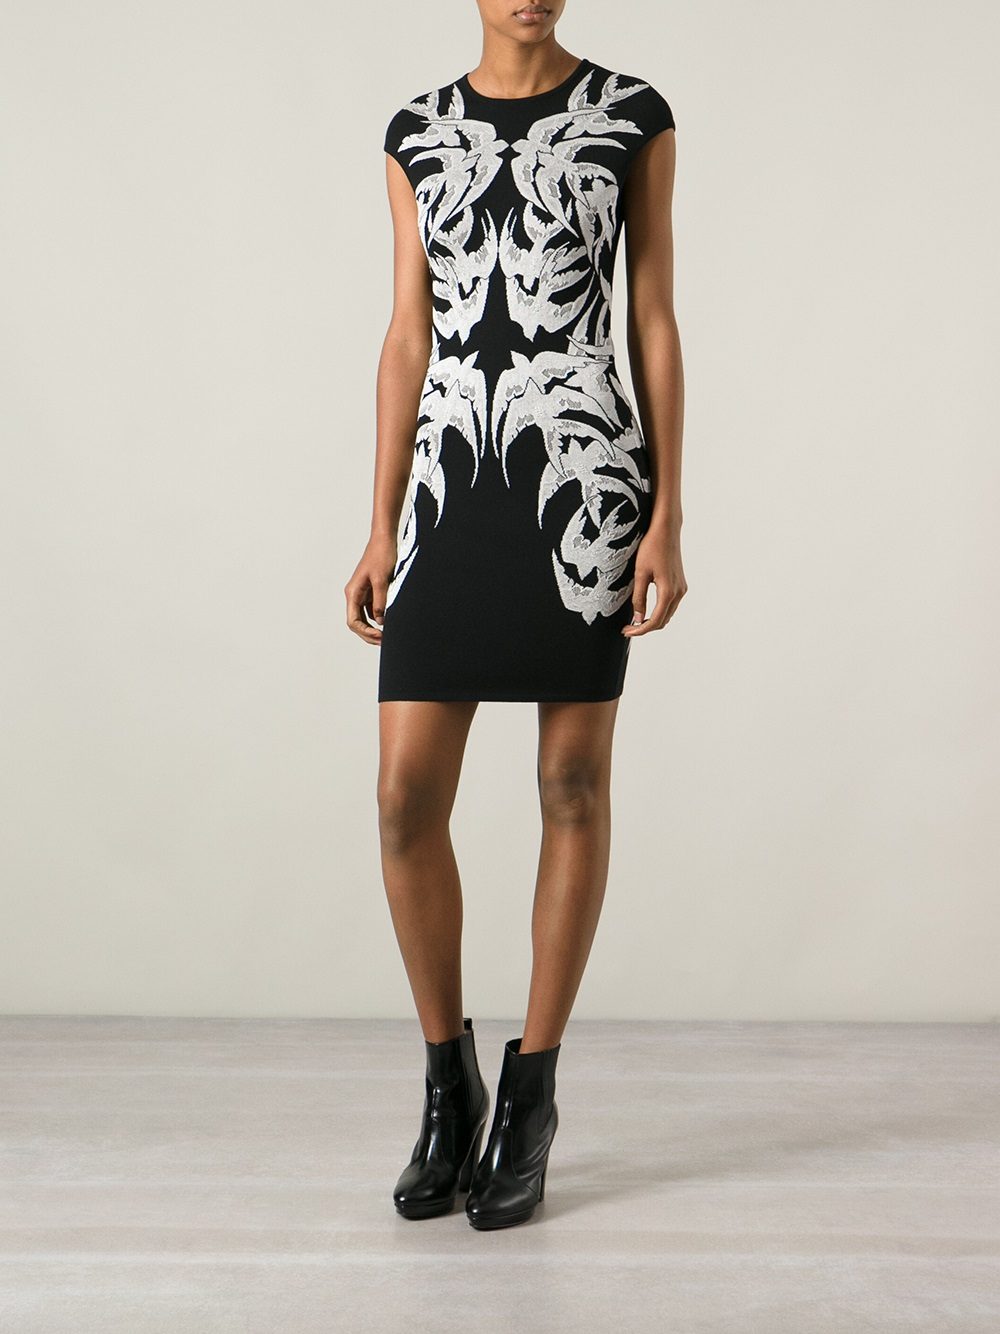 Alexander Mcqueen Lace Bird Jacquard Dress In Black Lyst